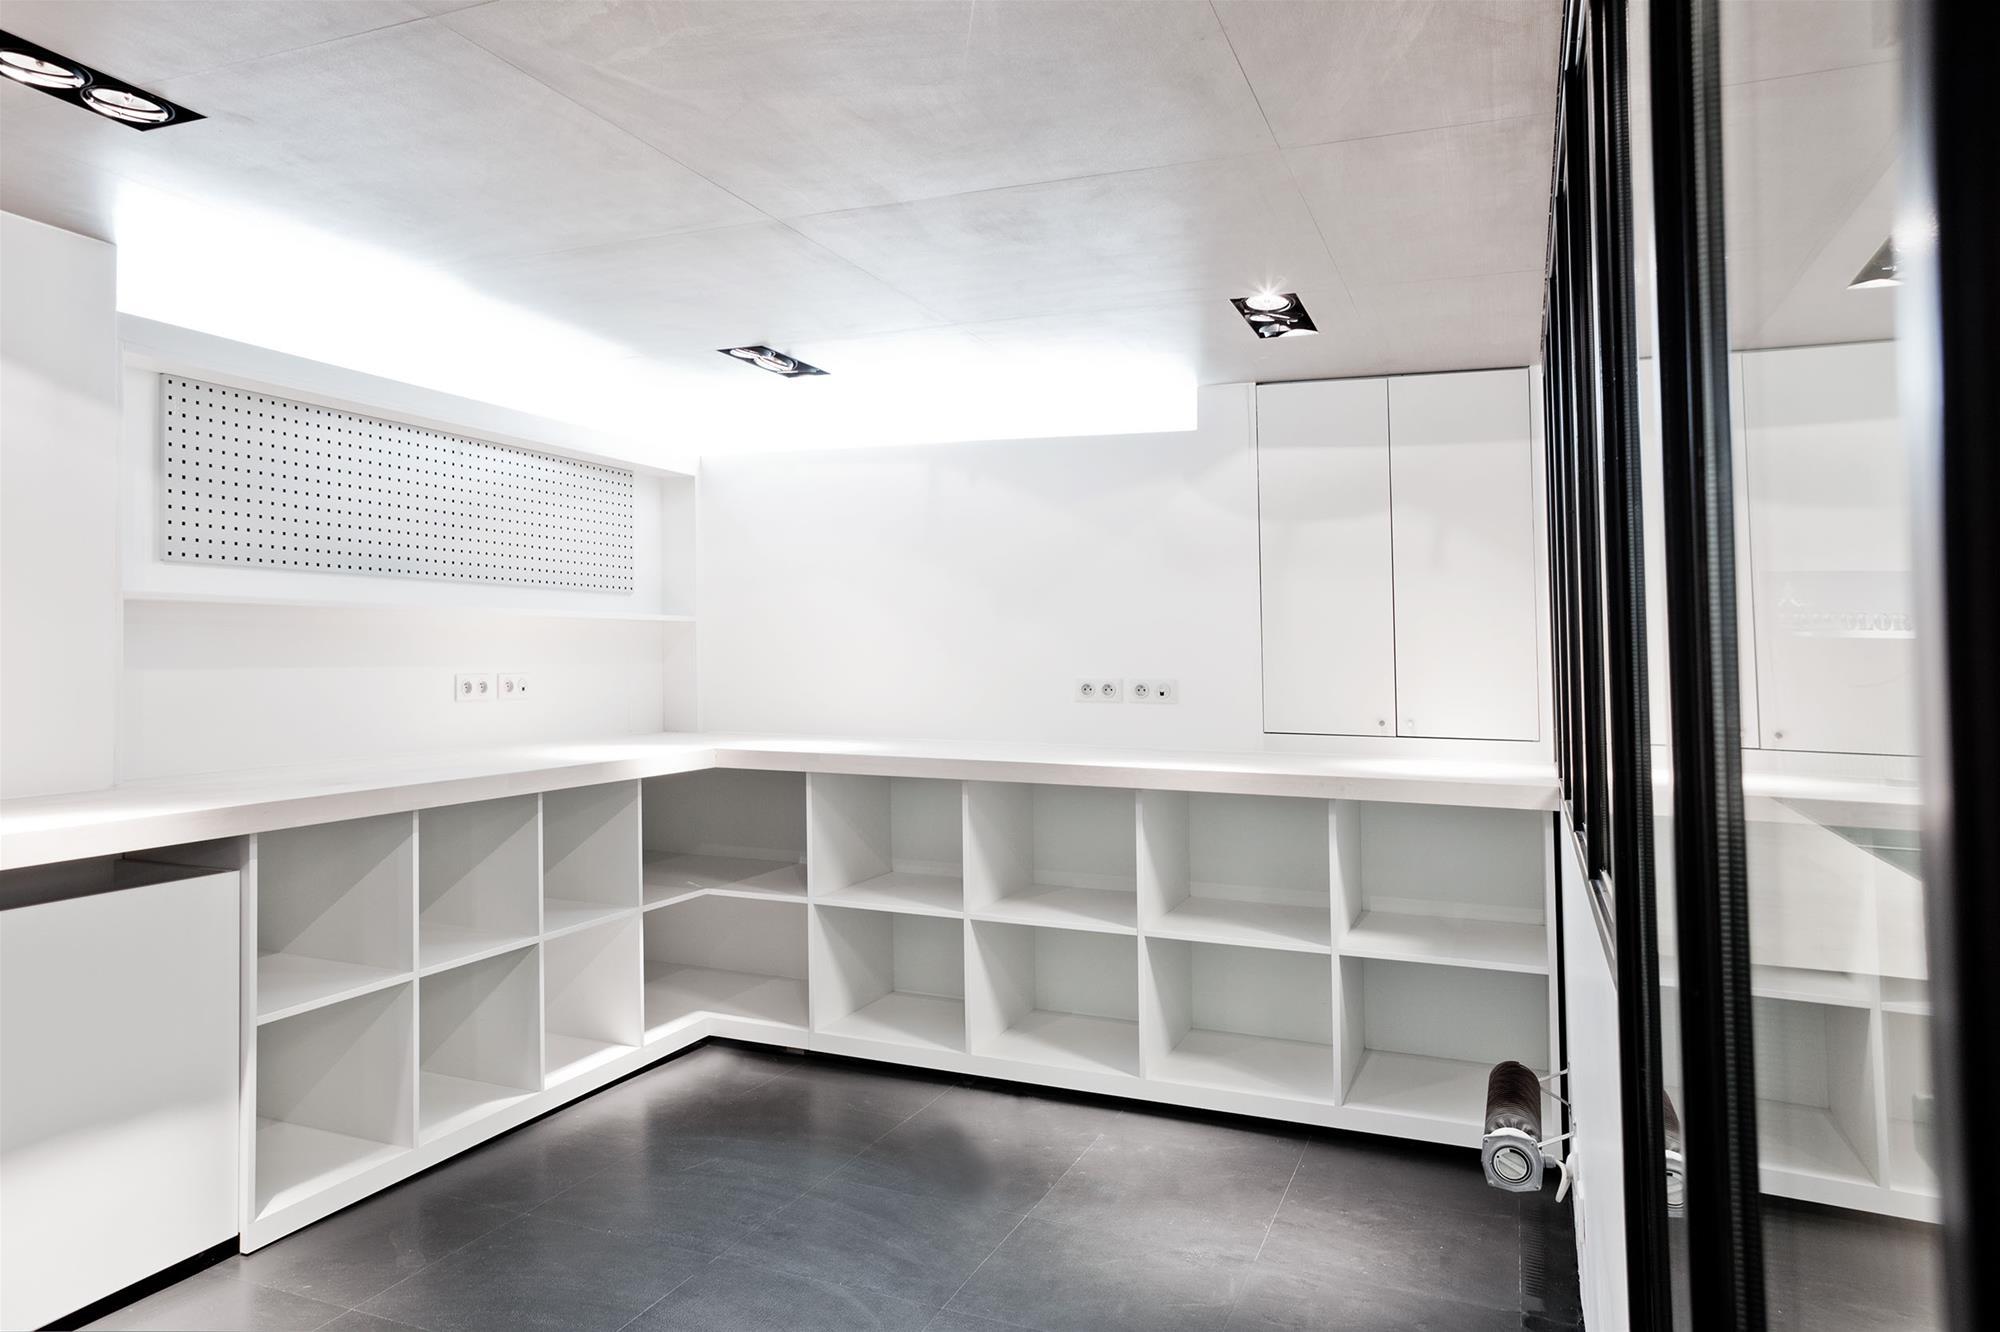 atelier_stefan_lubrina_interior_mobilier1.jpg